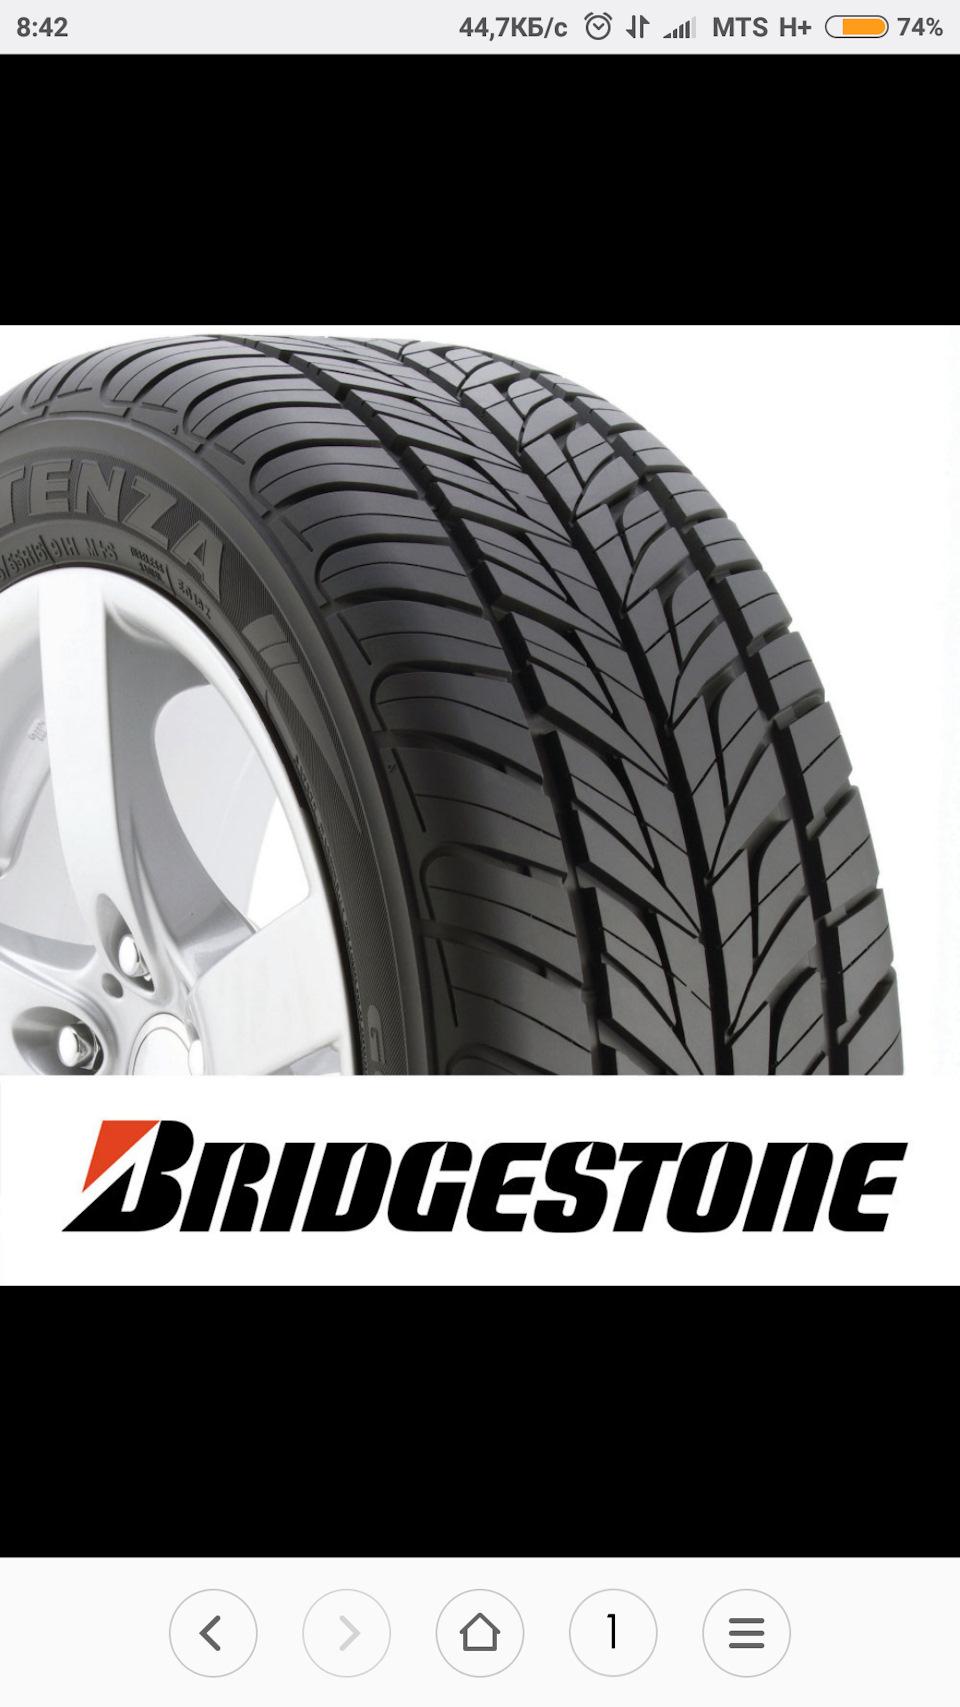 Ищу одно колесо или пару BRIDGESTONE POTENZA G019 225/60R16